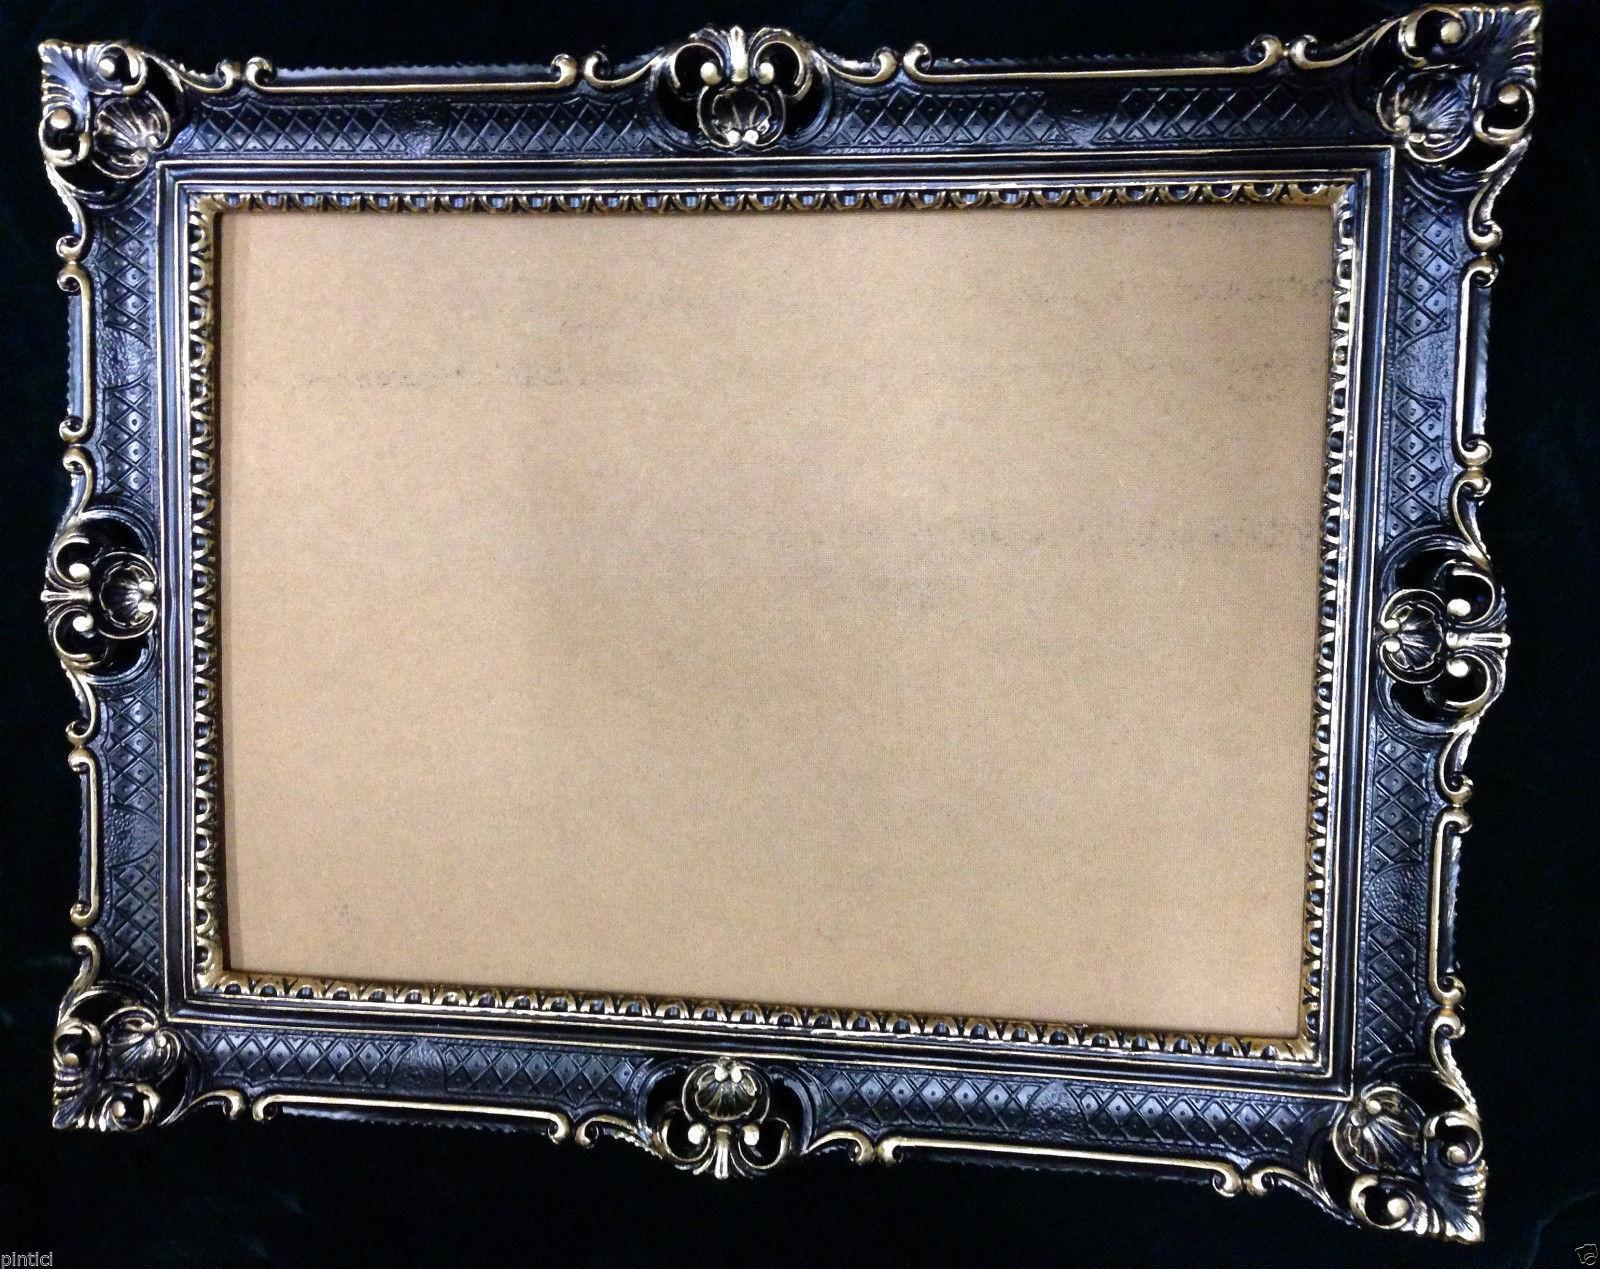 Bilderrahmen Antik Schwarz Gold hochzeitsrahmen Menü Tafel Großer Bilderrahmen Ramy